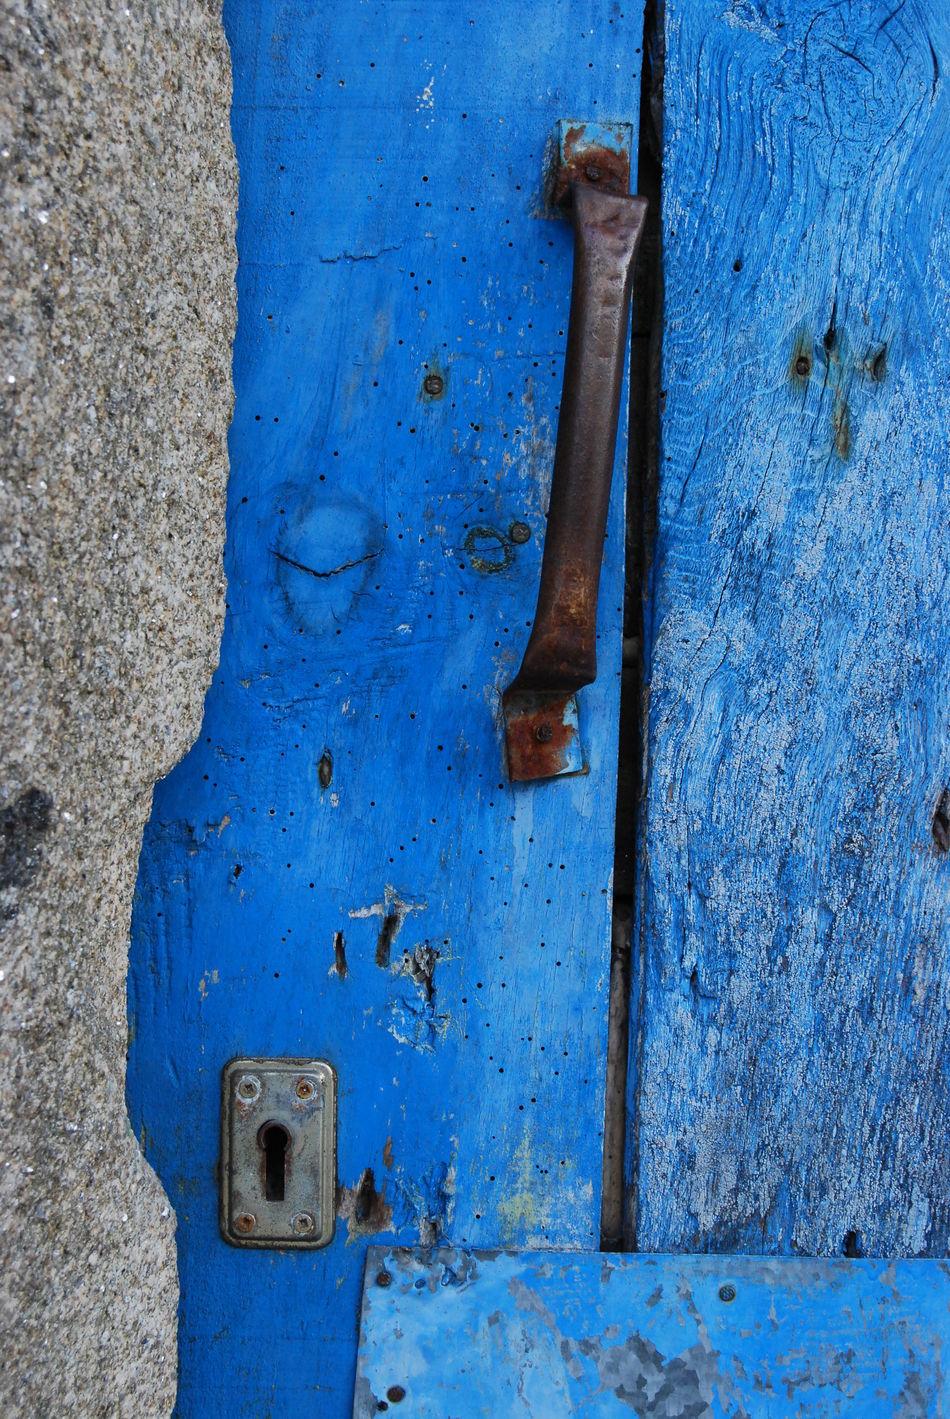 Old blue door Blue Blue Wave Closed Handle Lock Old Old_door Wood - Material